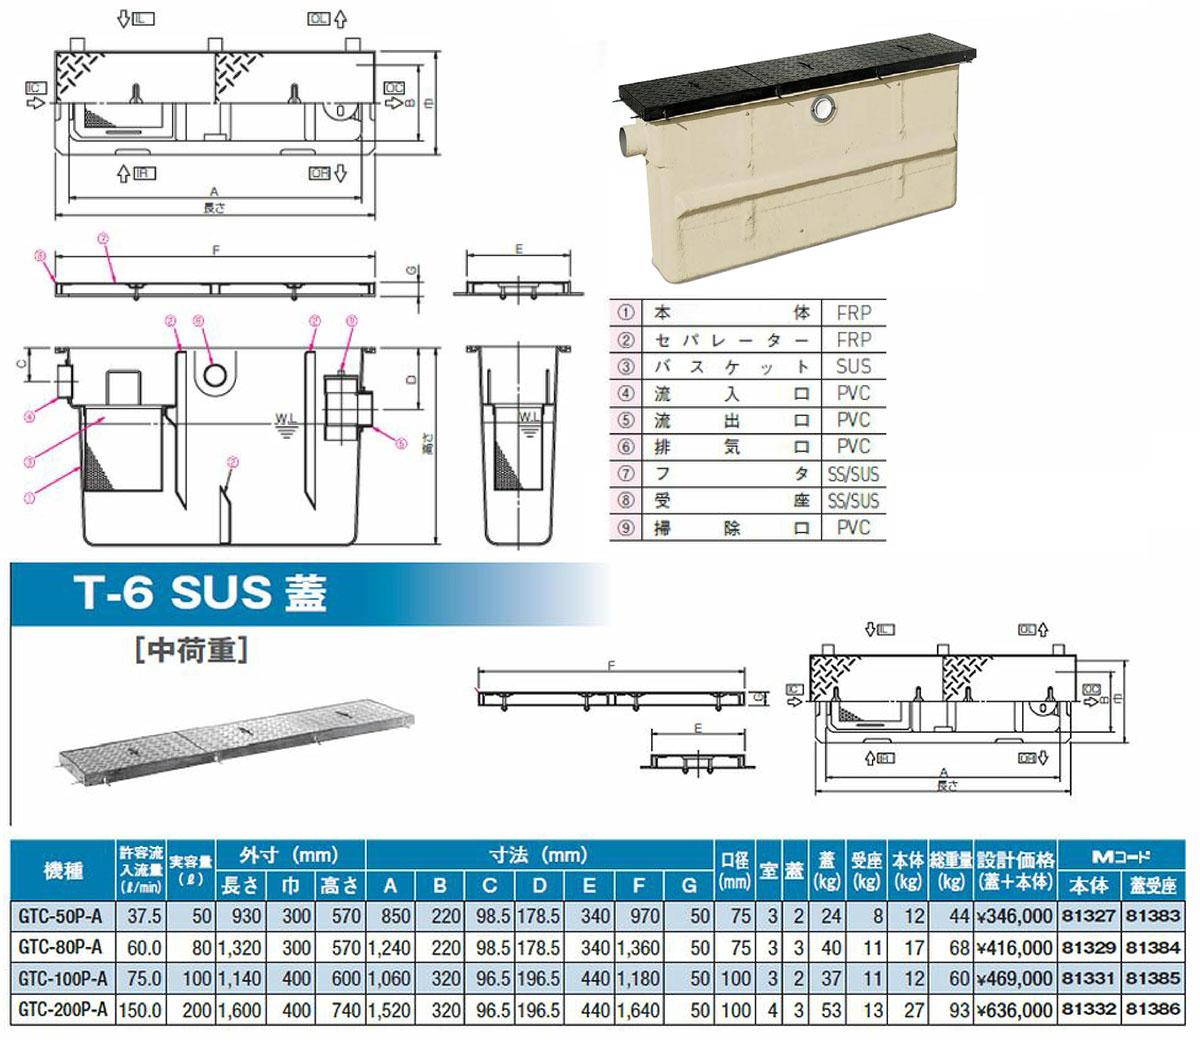 【GTC-100P-A T-6 SUS蓋】 《TKF》 マエザワ グリーストラップ パイプ流入埋設スリム型 GTC ωε1